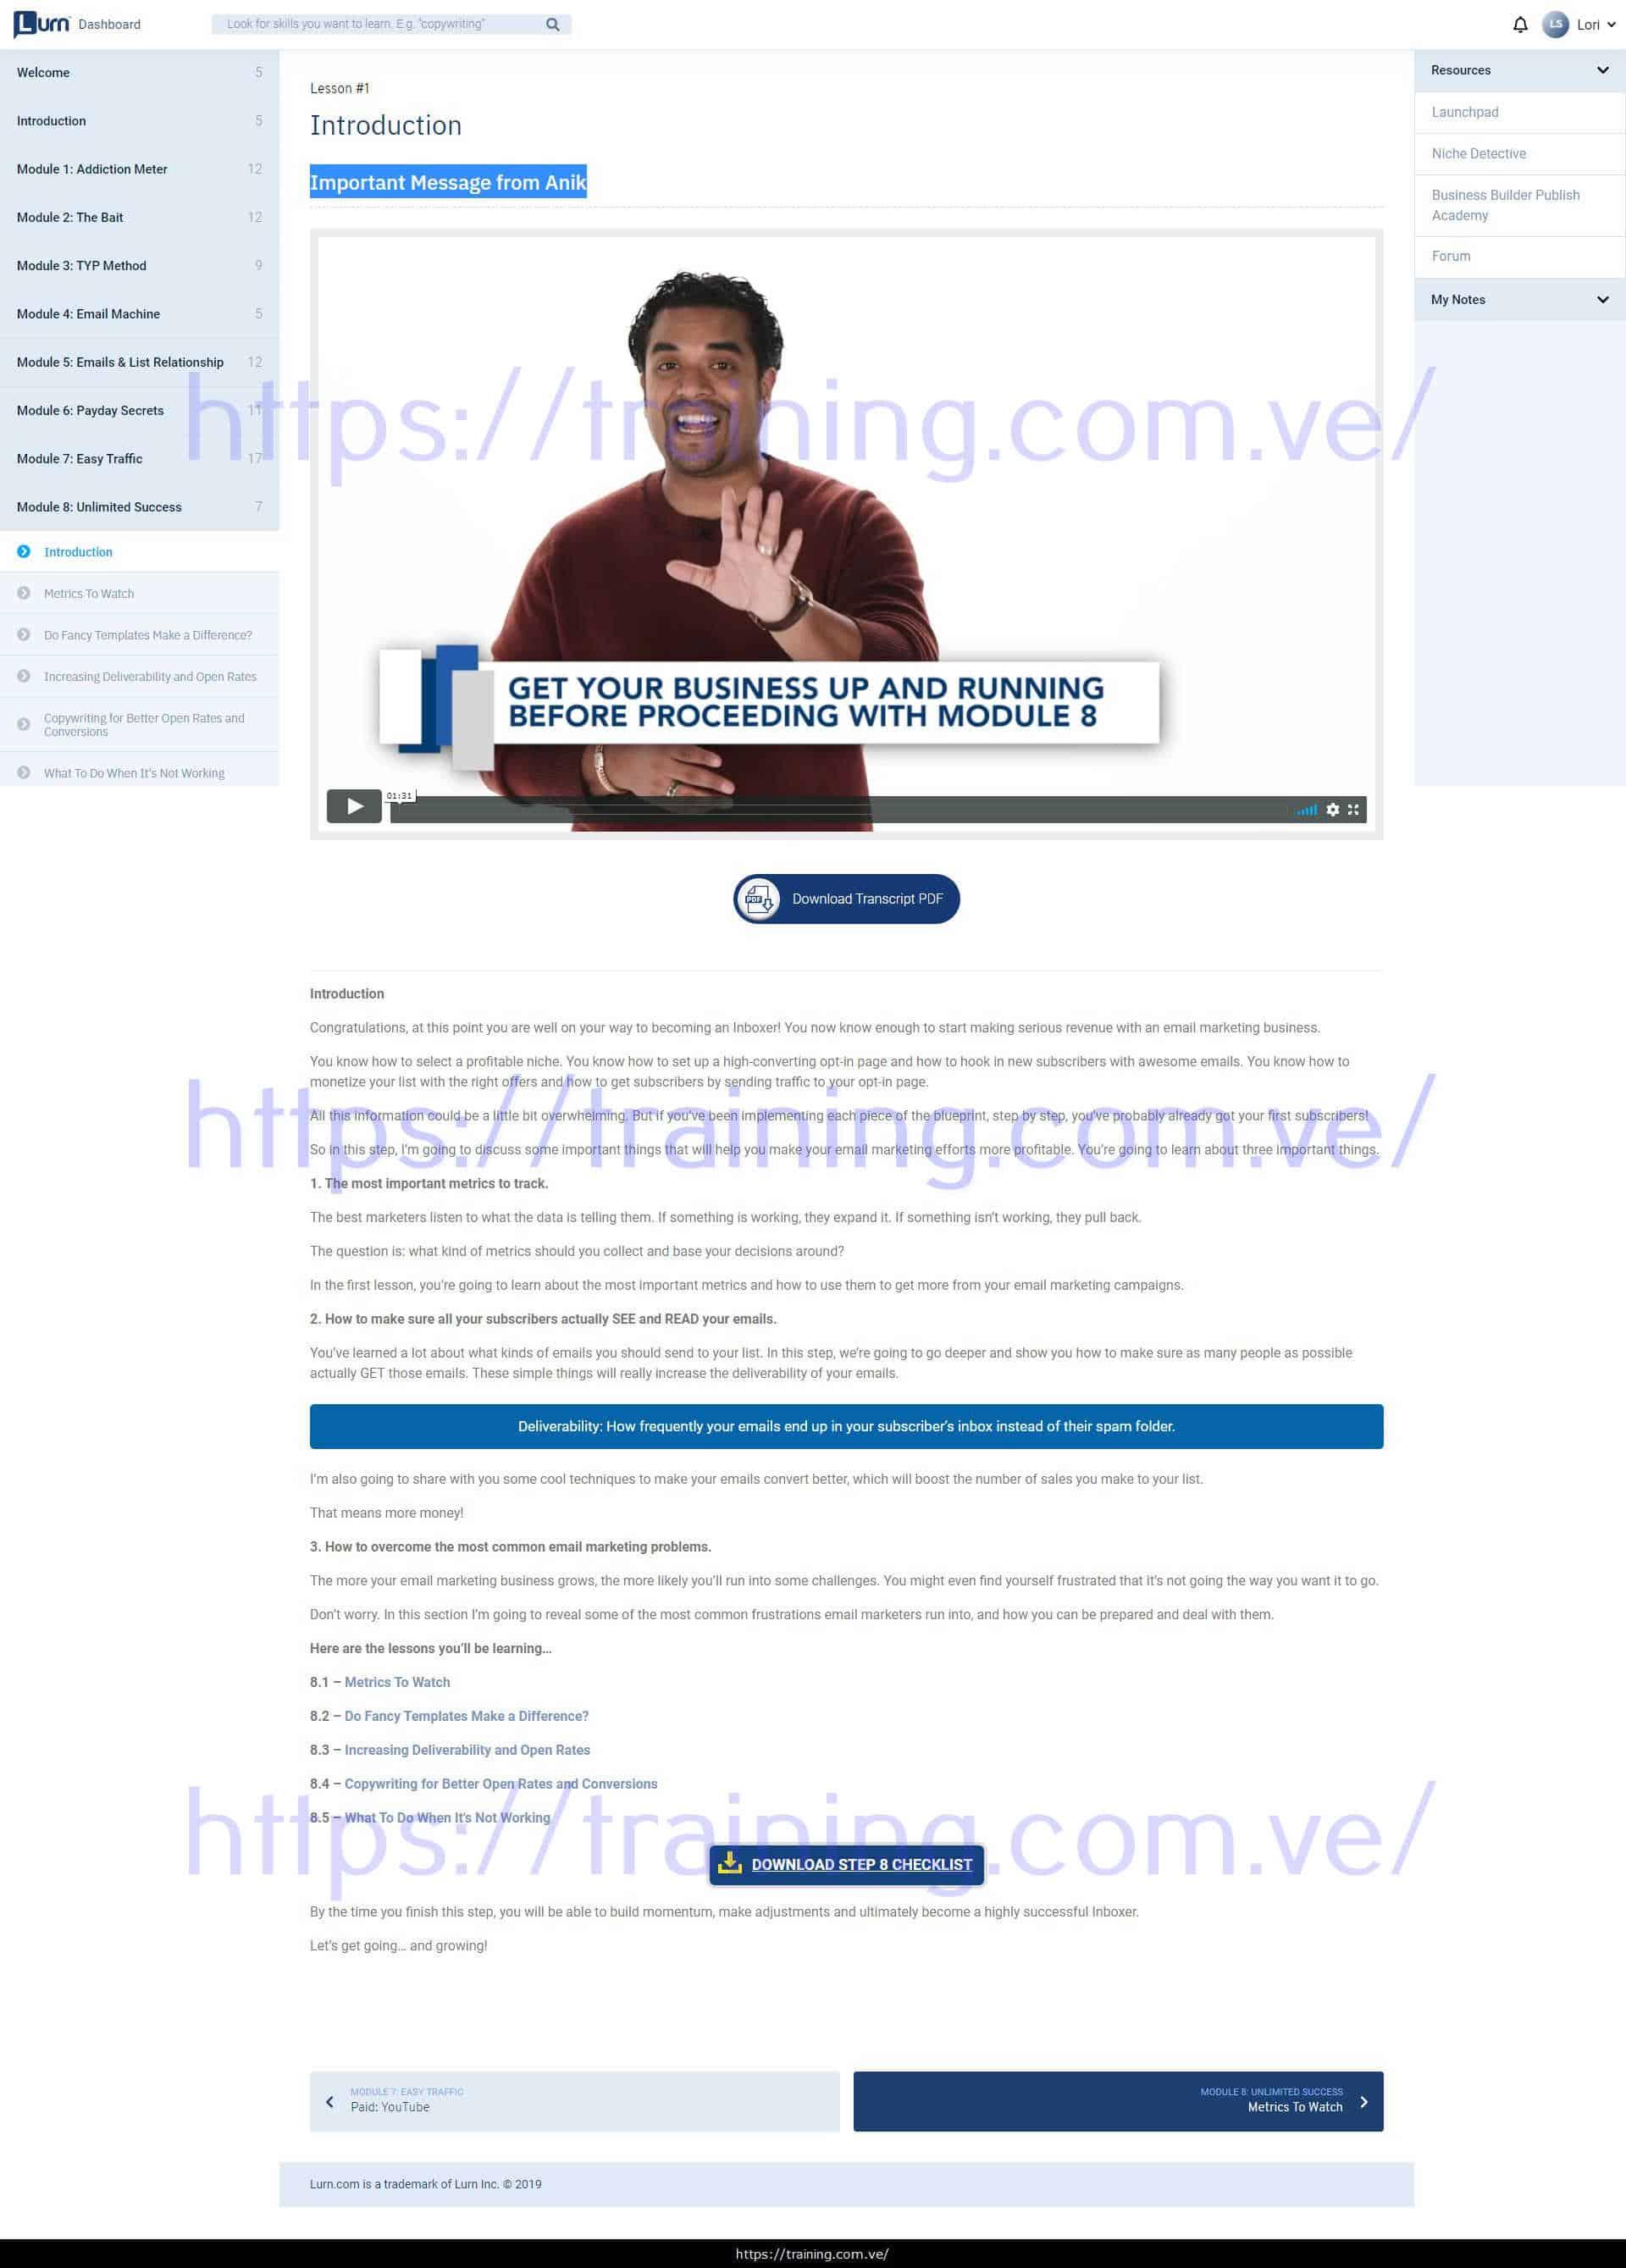 Inbox Blueprint by Anik Singal Download